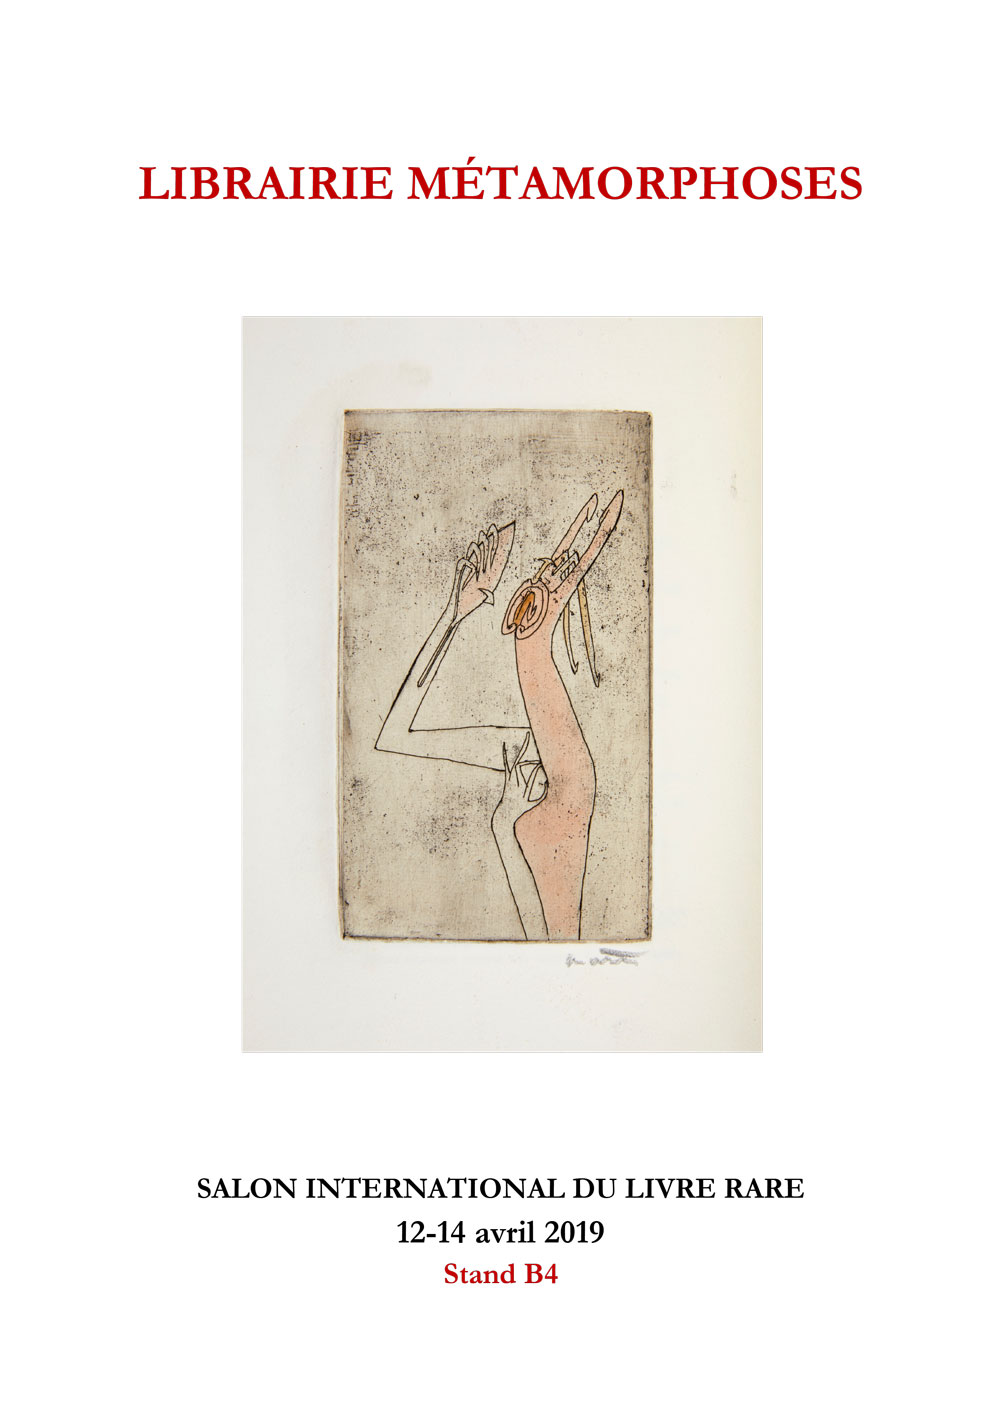 SALON INTERNATIONAL DU LIVRE RARE 2019